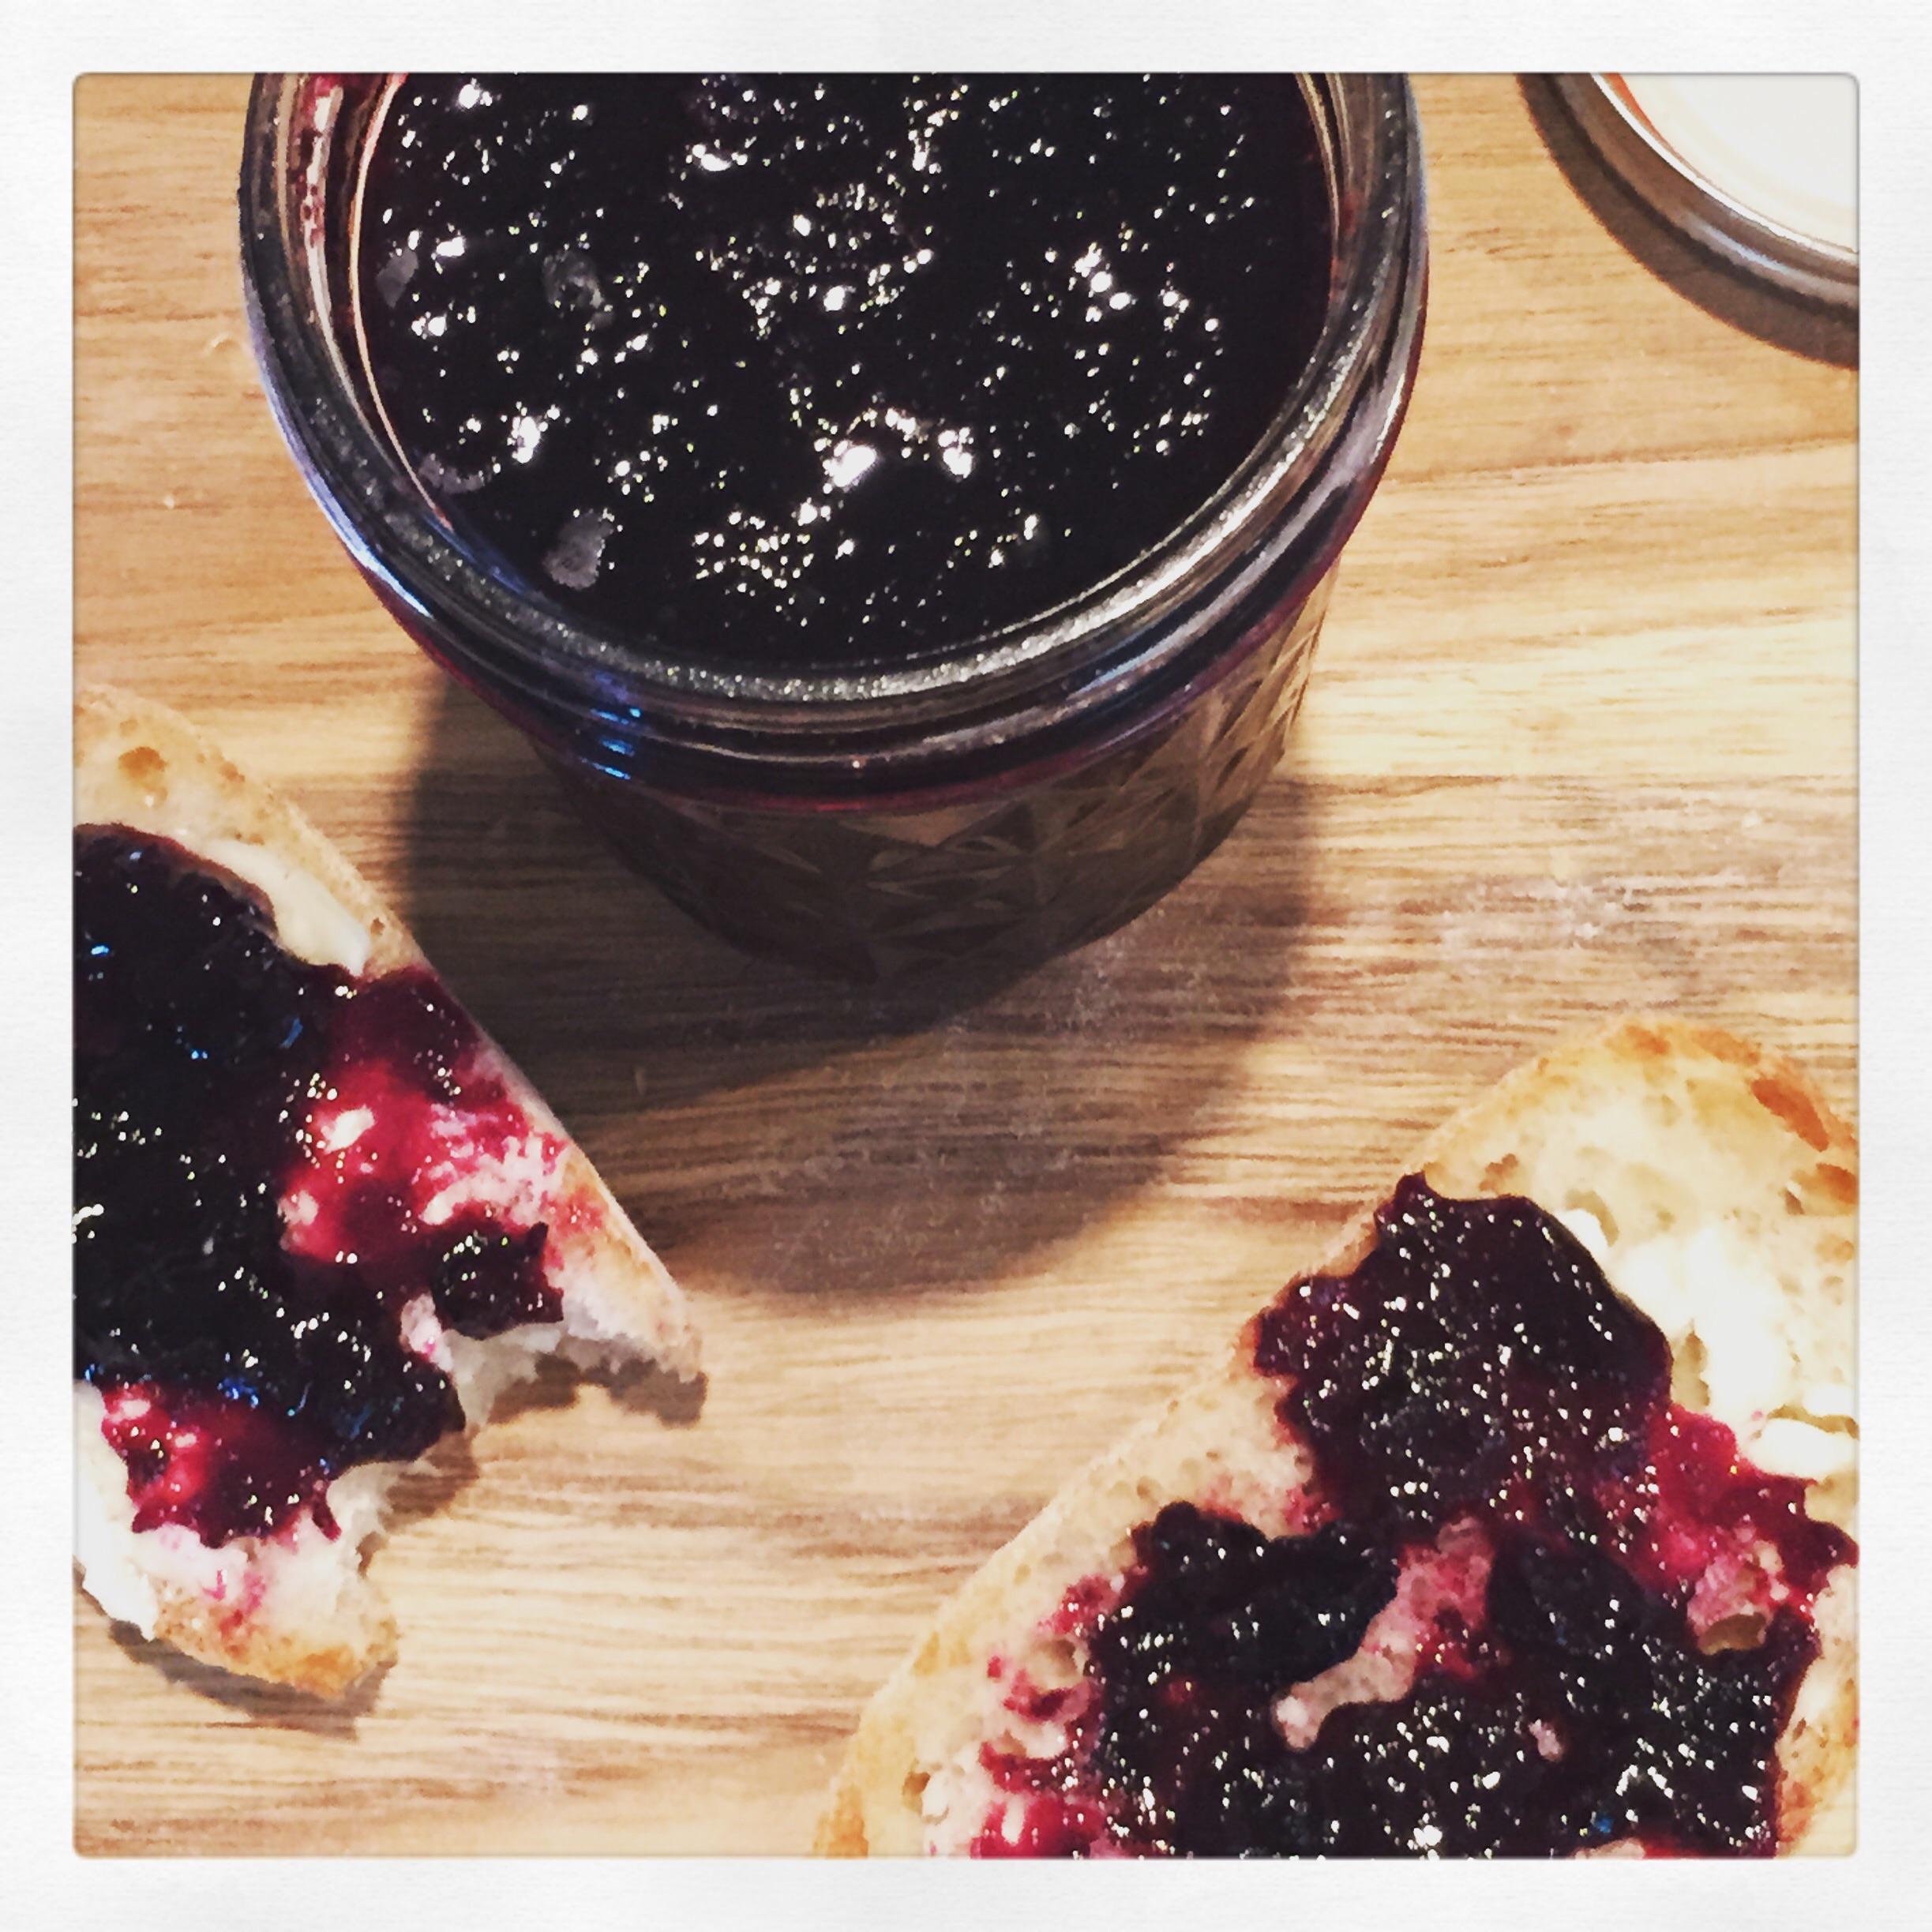 Homemade blueberry jam - easy as pie! Via The Entertaining House